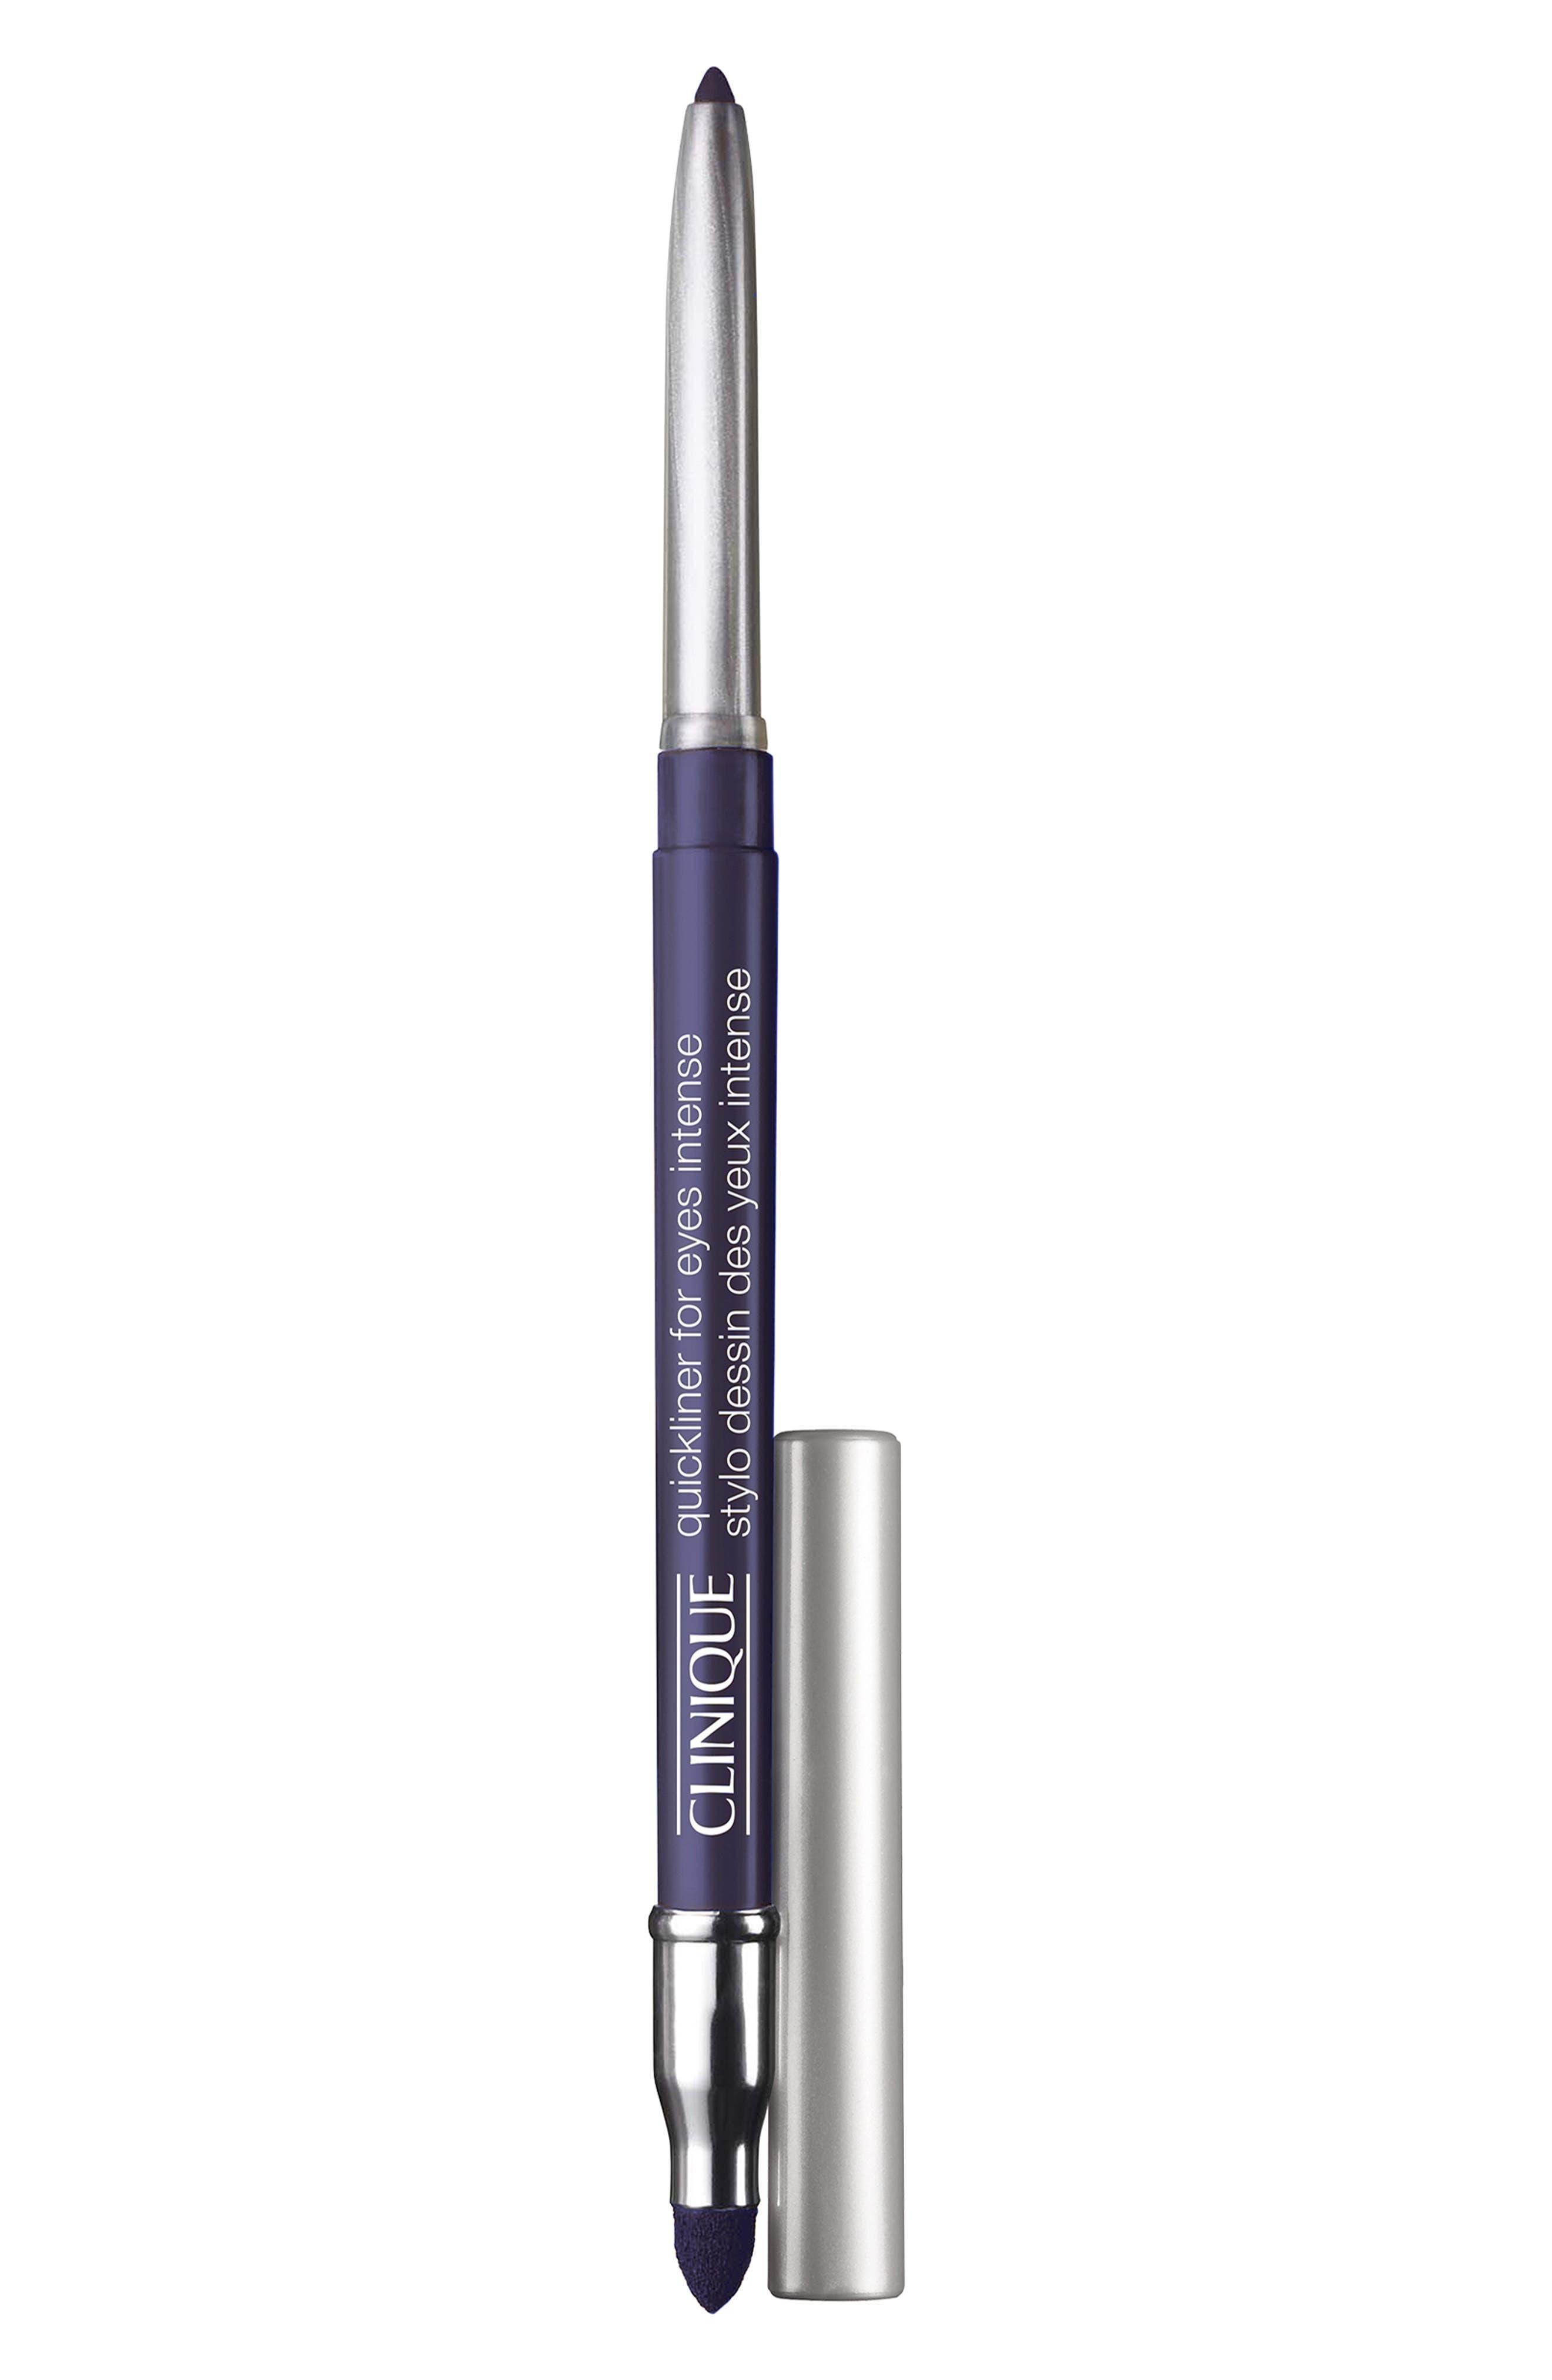 Clinique Quickliner For Eyes Intense Eyeliner Pencil - Intense Plum